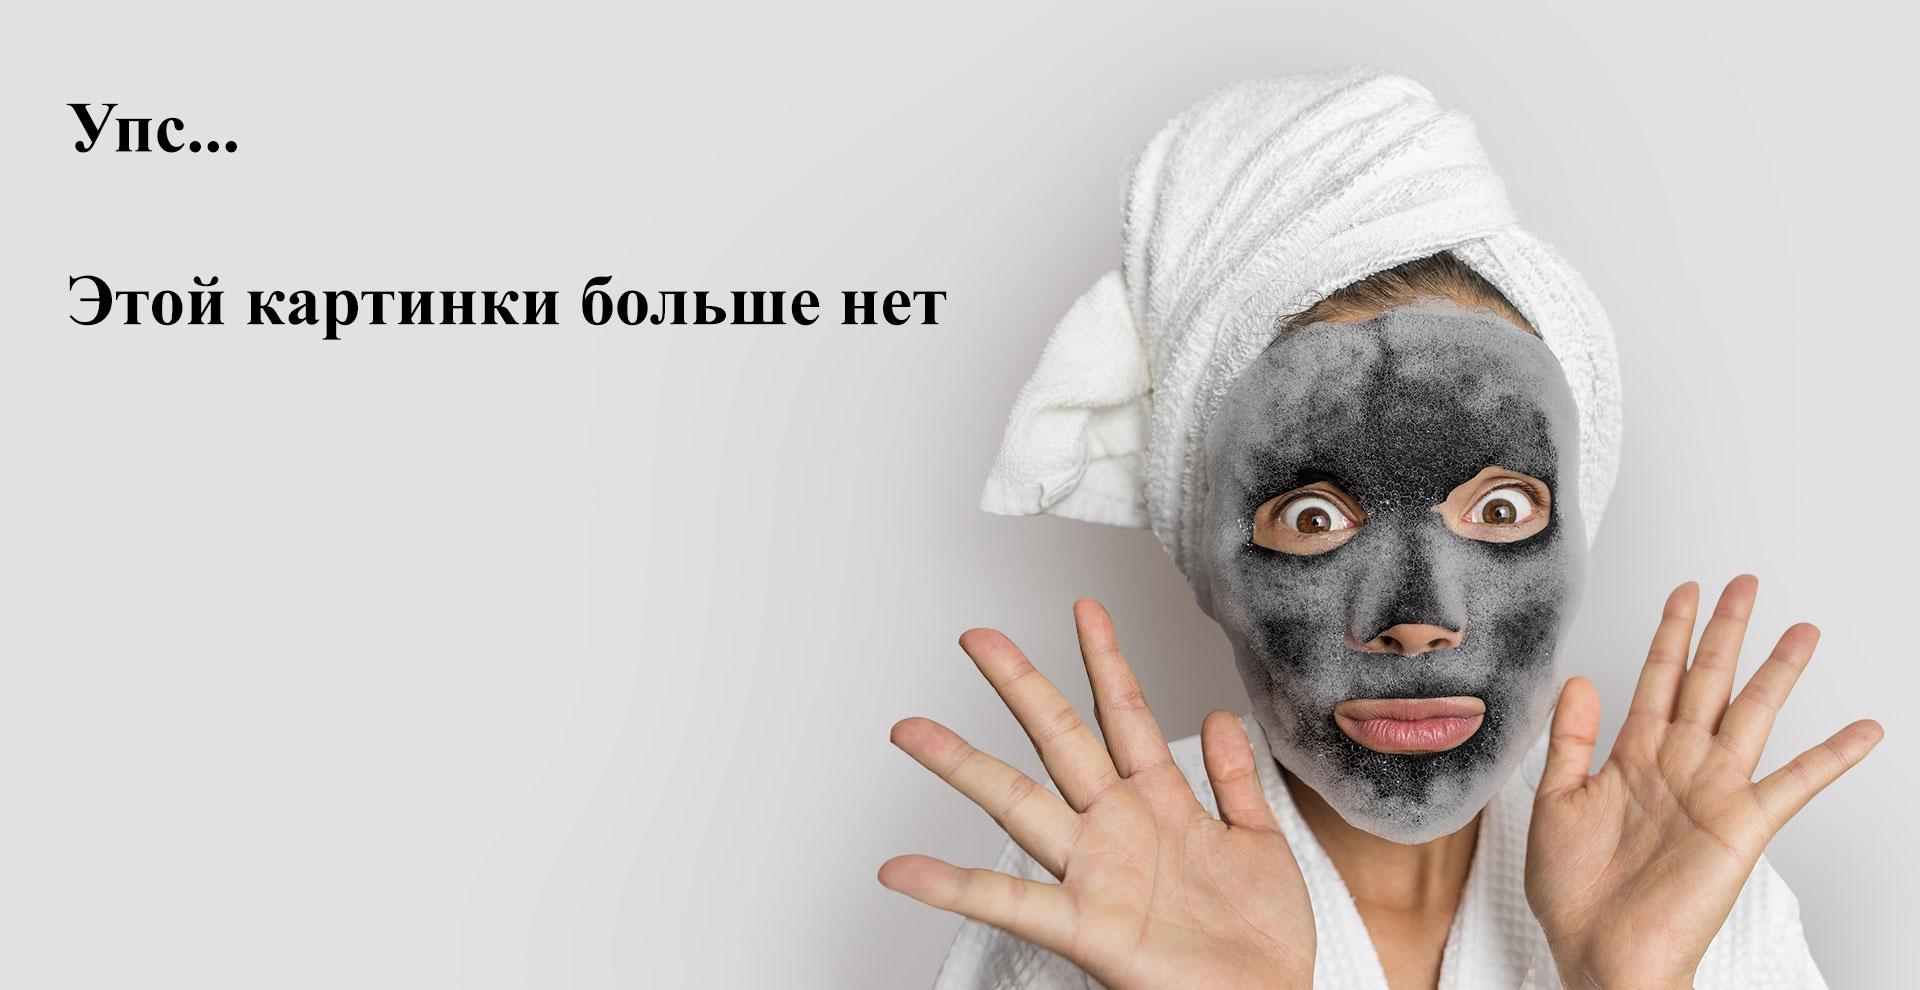 Siberina, Пена для ванны «Ромашка», 250 мл